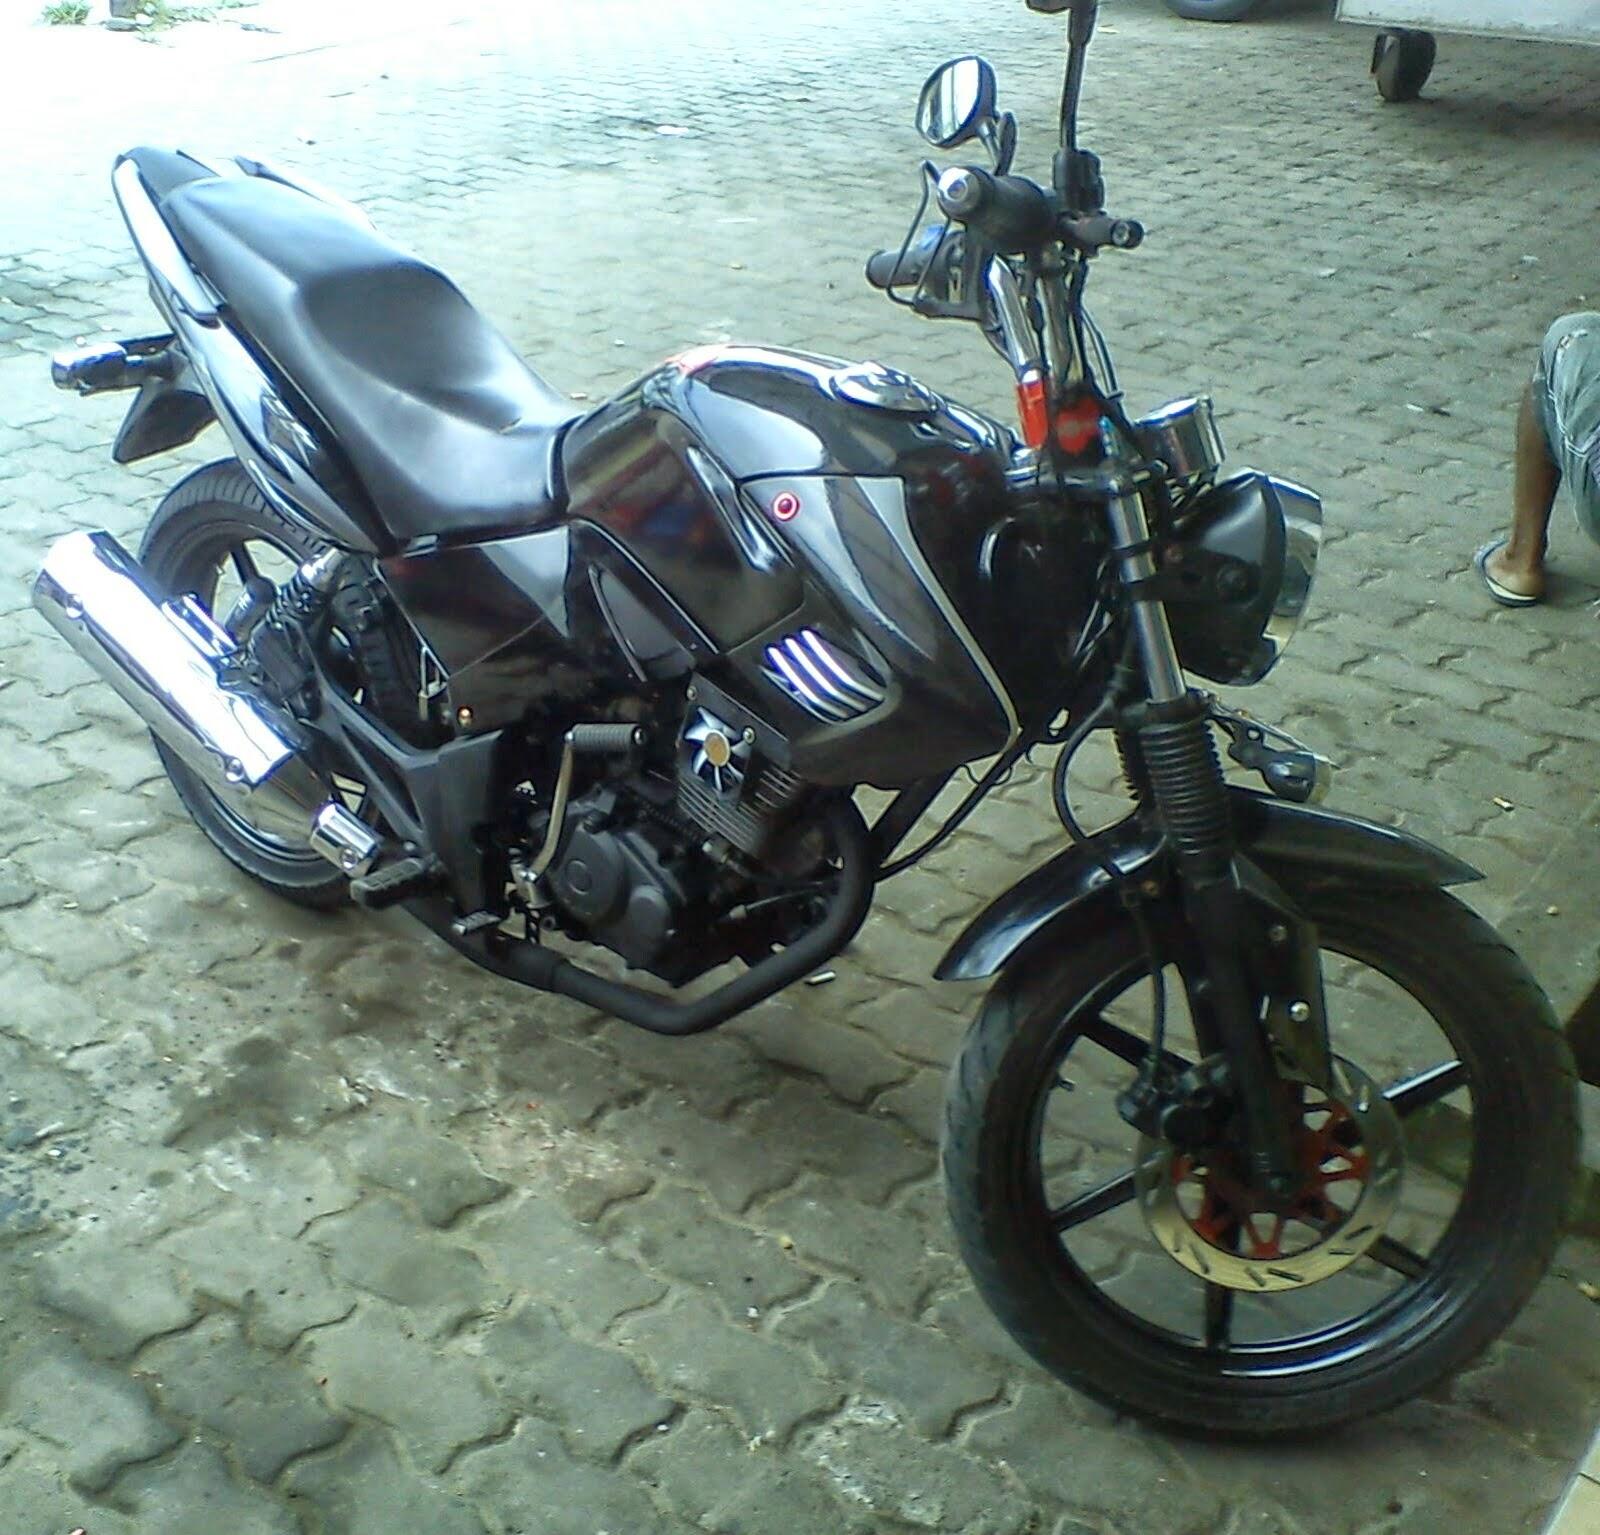 Koleksi Modifikasi Motor Tiger Revo Minimalis Terupdate Velgy Stang Thecitycyclist